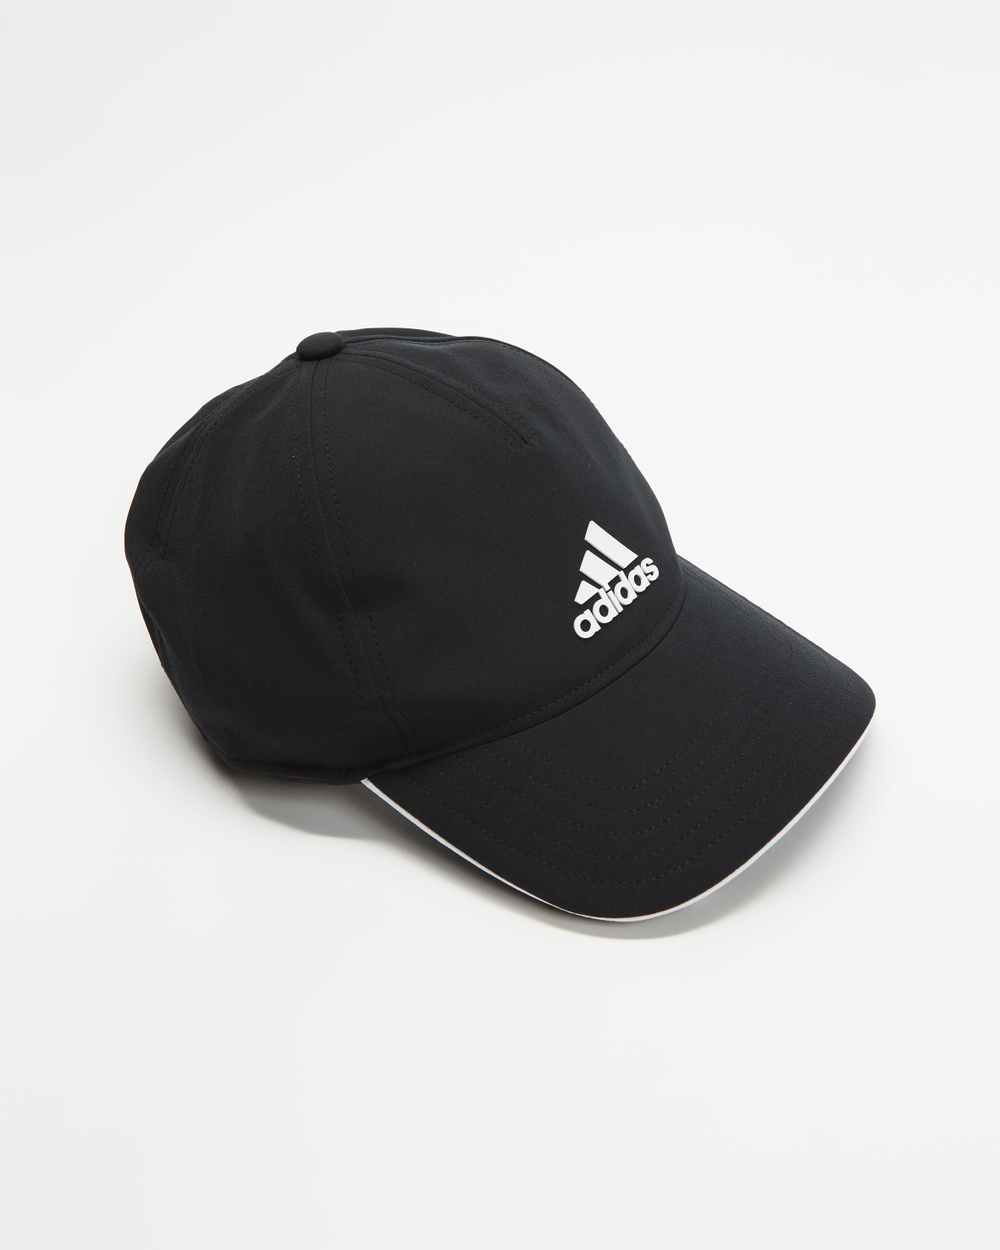 adidas Performance AEROREADY Baseball Cap Headwear Black & White